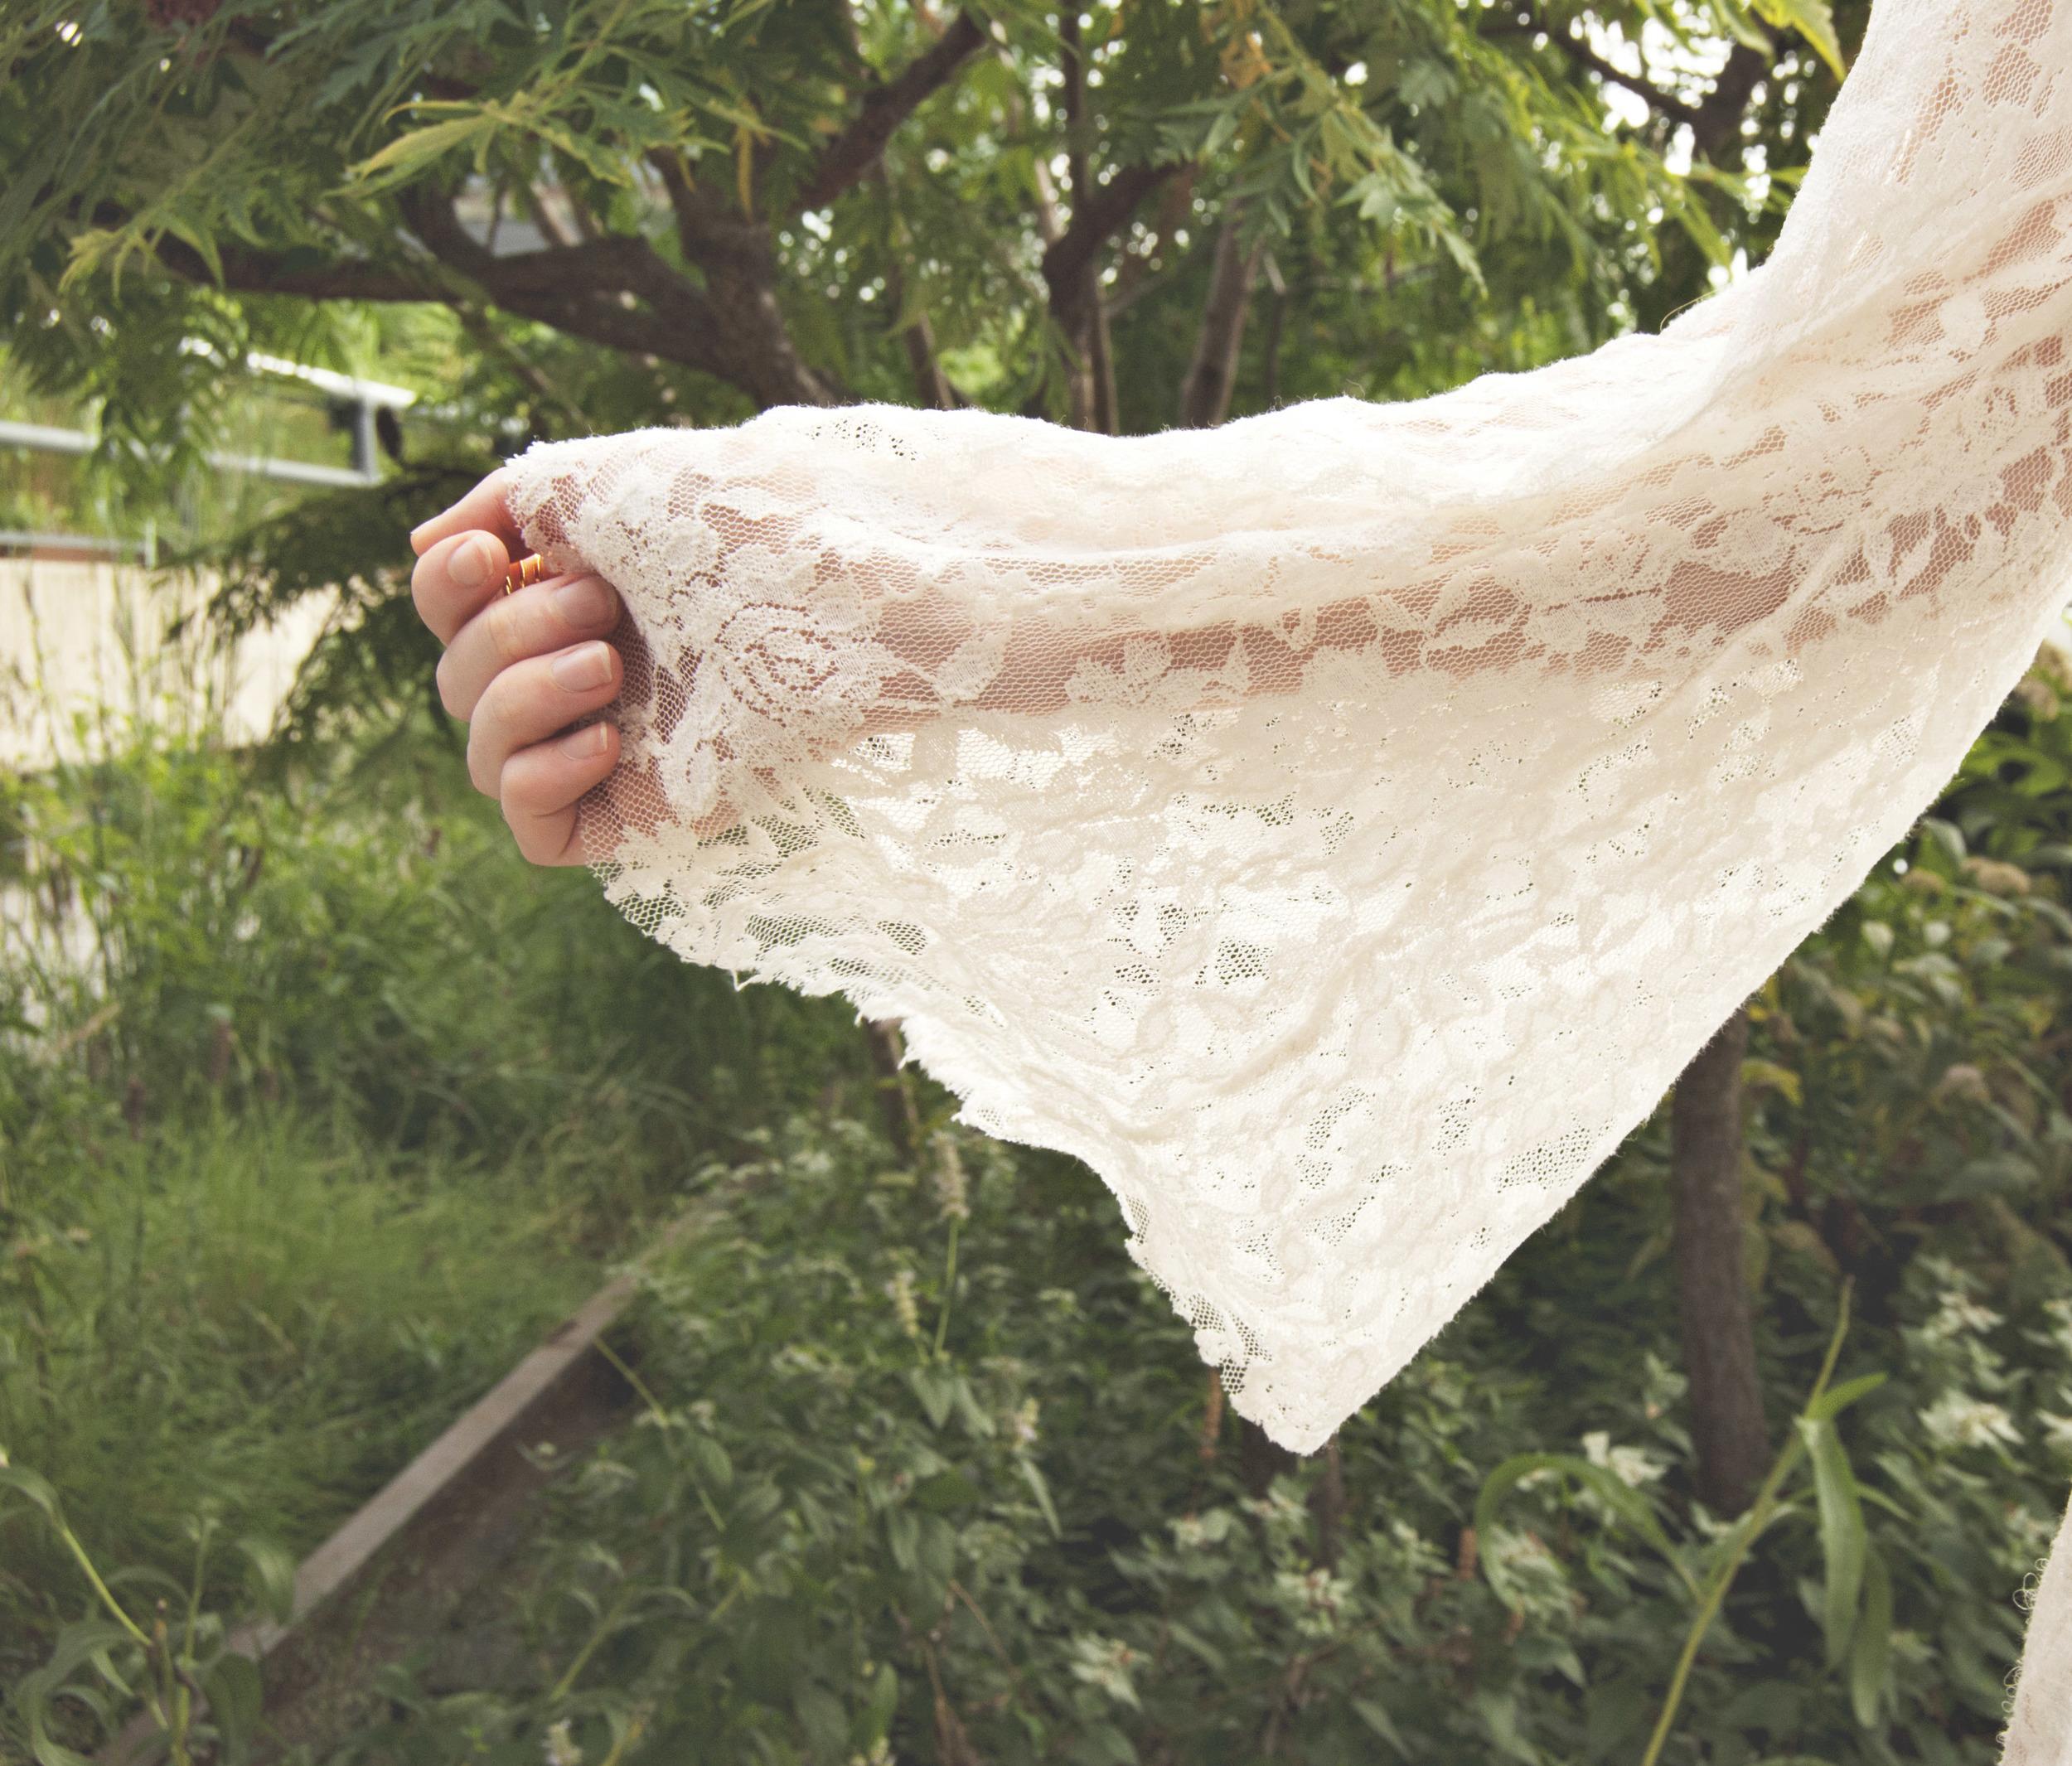 Sheer White Lace Sleeve (via Girl x Garment)